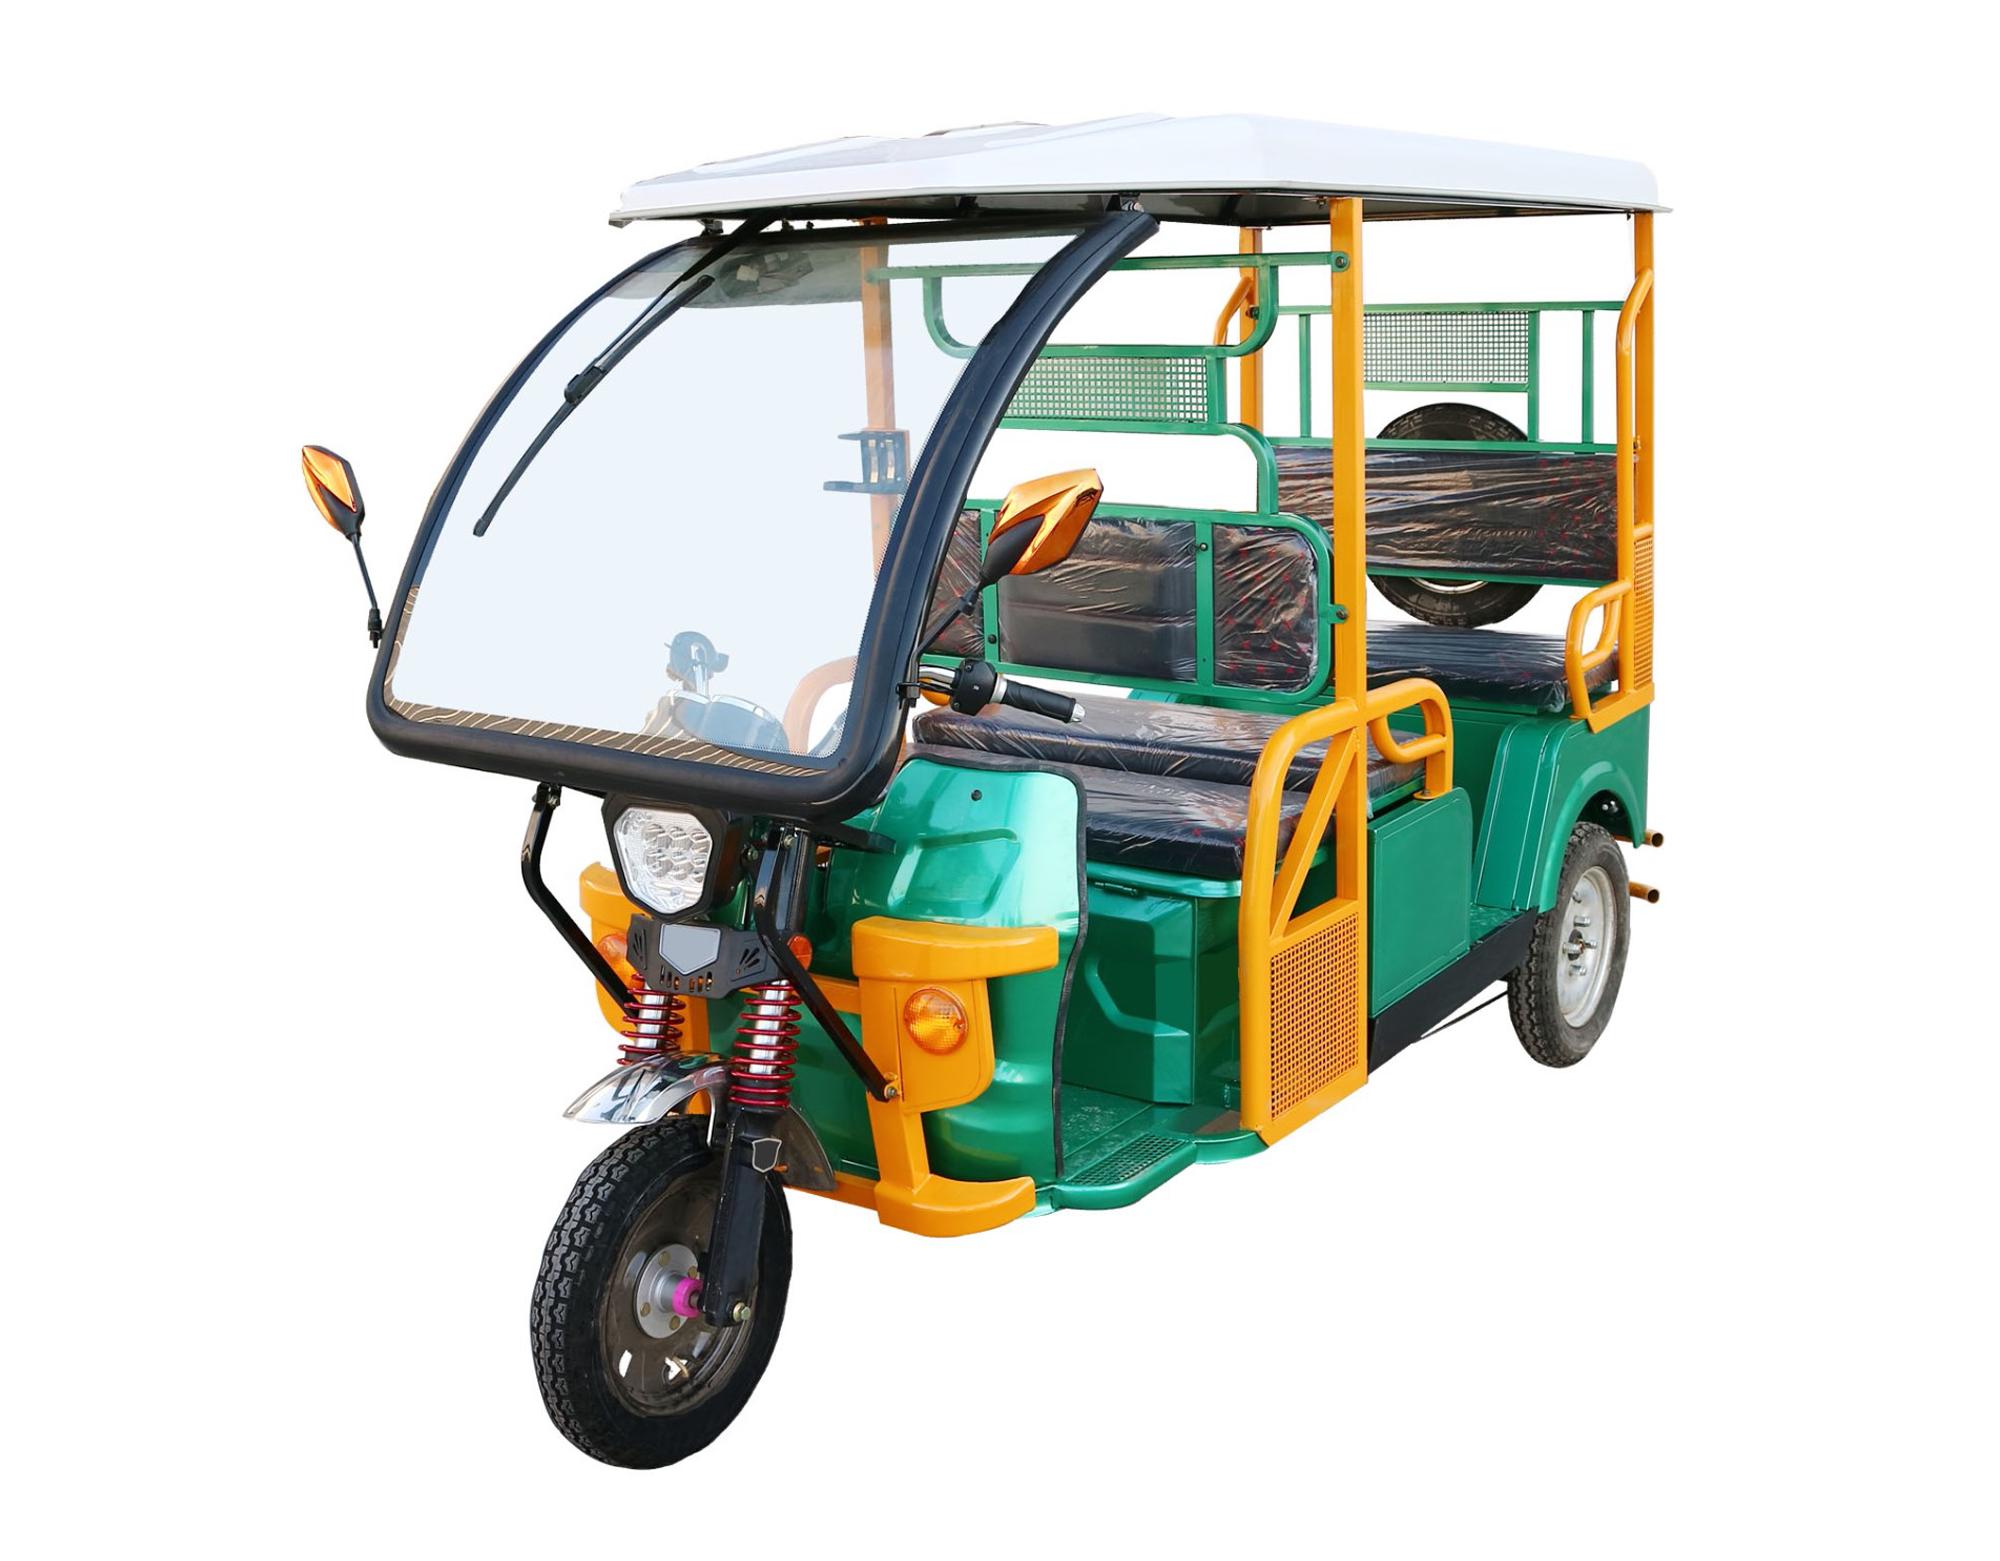 High quality Passenger Electric 3 Wheels Tuk Tuk Quotes,China Passenger Electric 3 Wheels Tuk Tuk Factory,Passenger Electric 3 Wheels Tuk Tuk Purchasing